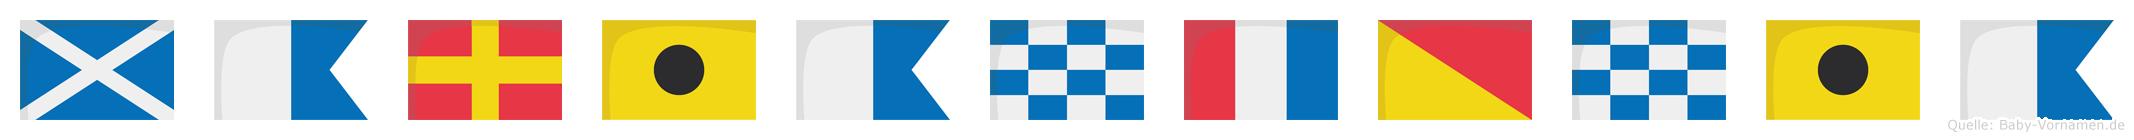 Mariantonia im Flaggenalphabet